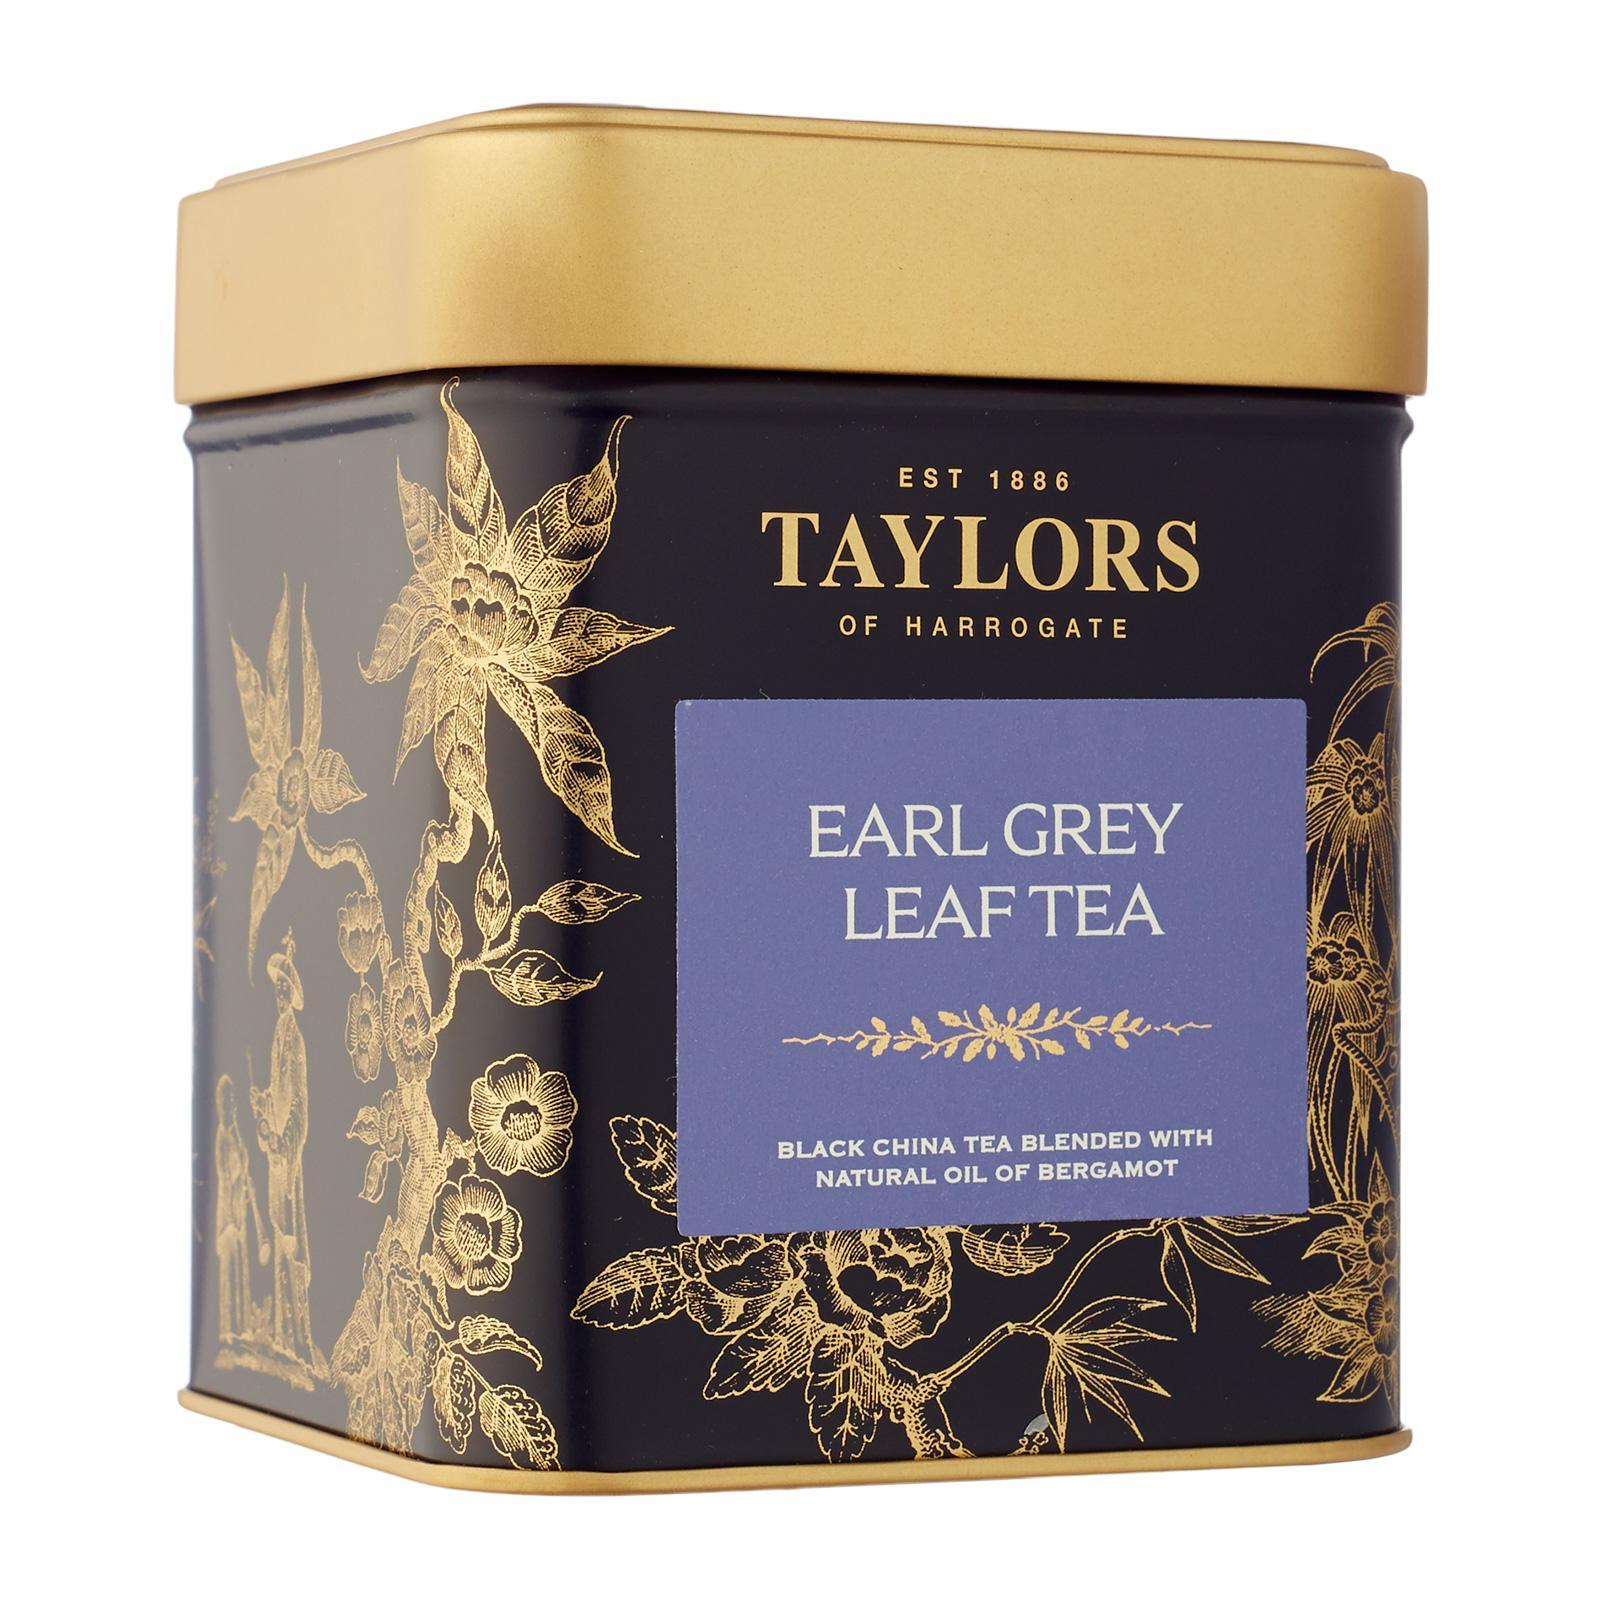 Taylors Of Harrogate Earl Grey Tea Leaf Caddy